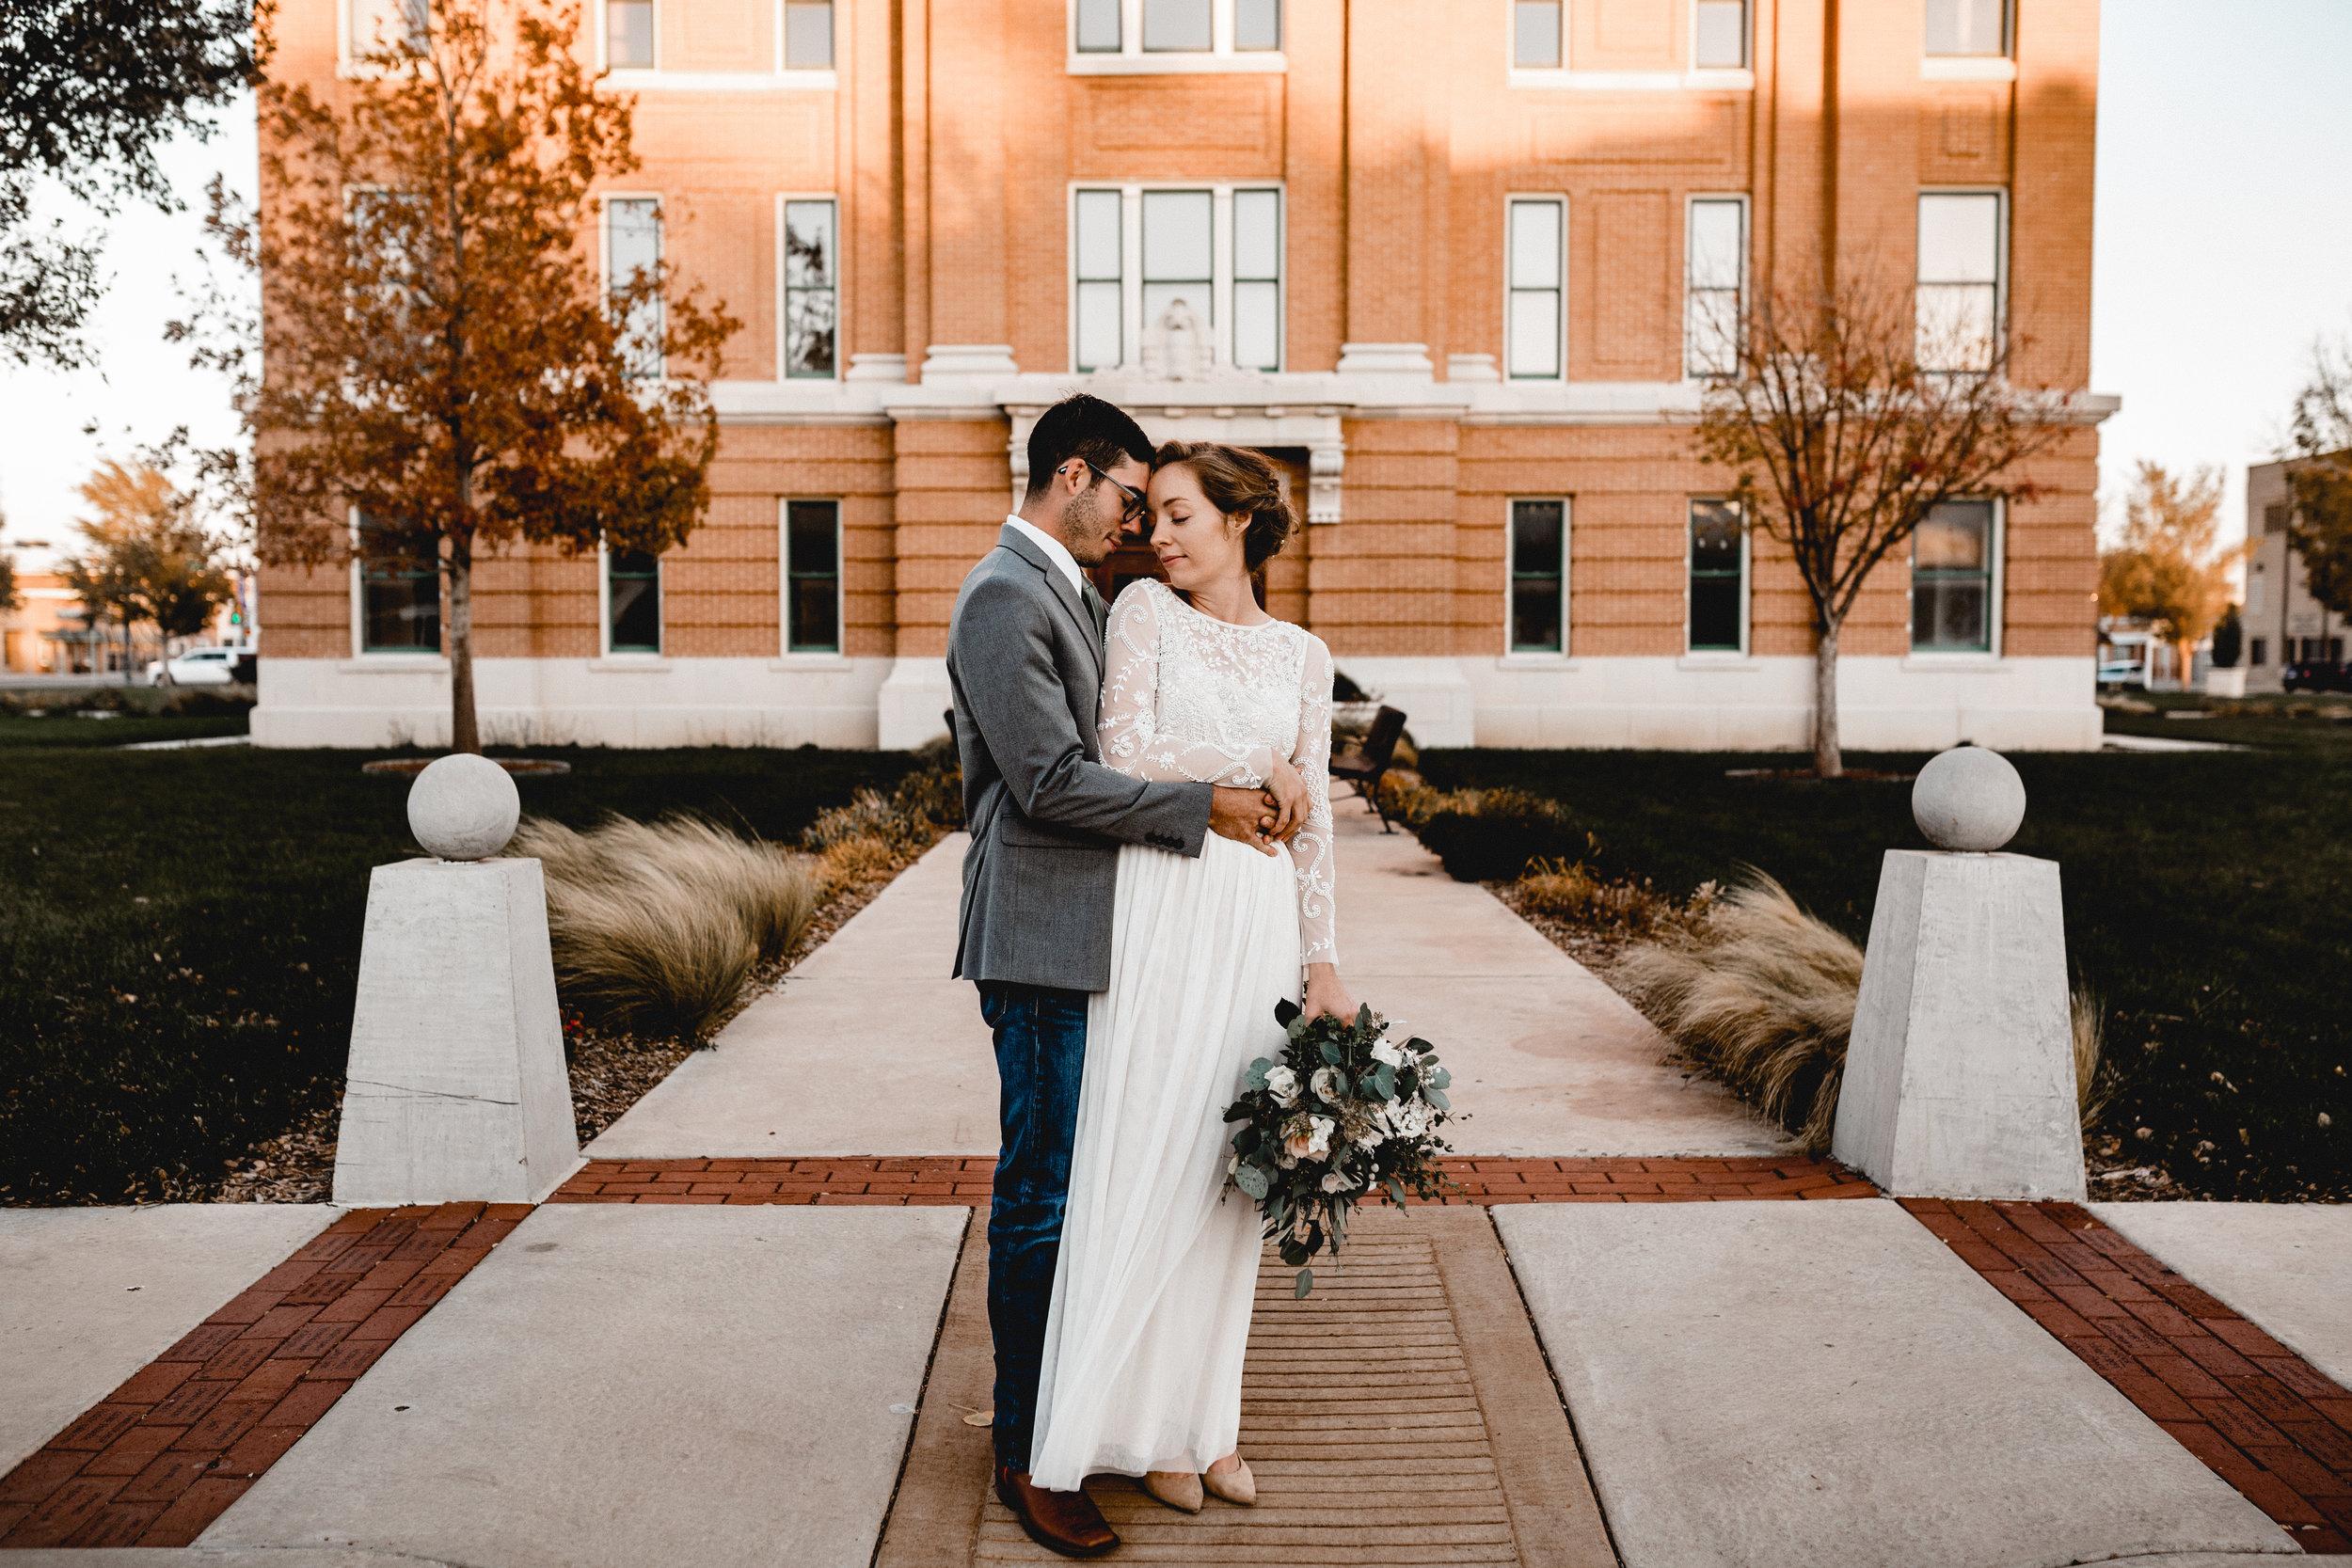 amarillo canyon lubbock texas wedding photography photographer palace coffee company